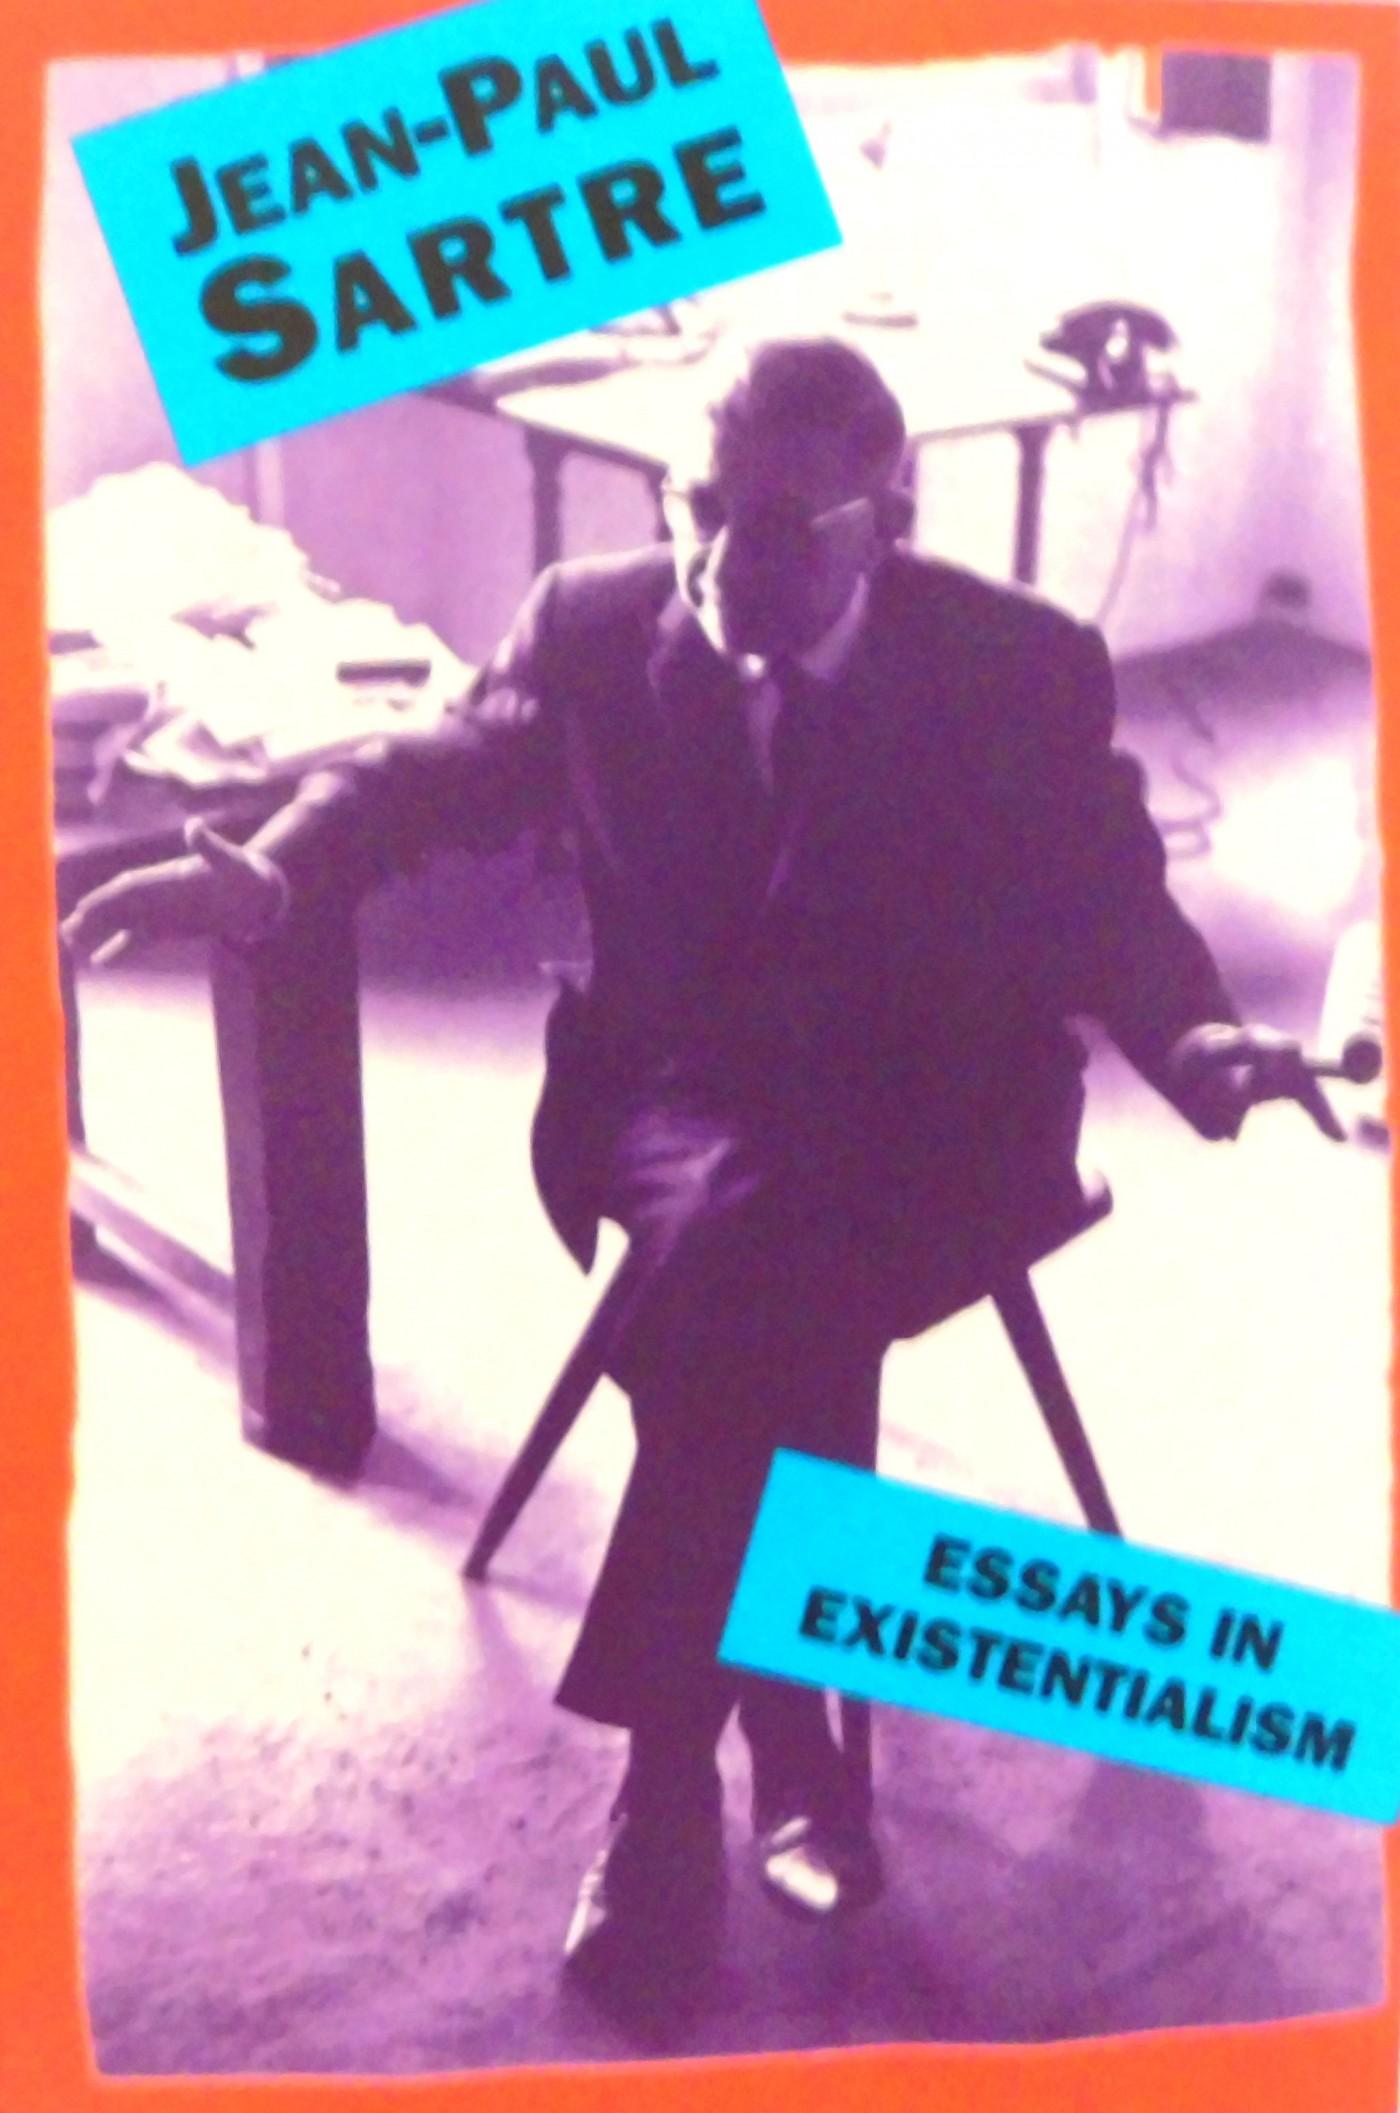 007 X Essay Example Essays In Outstanding Existentialism Sartre Tumblr Clarke Lexa 1400